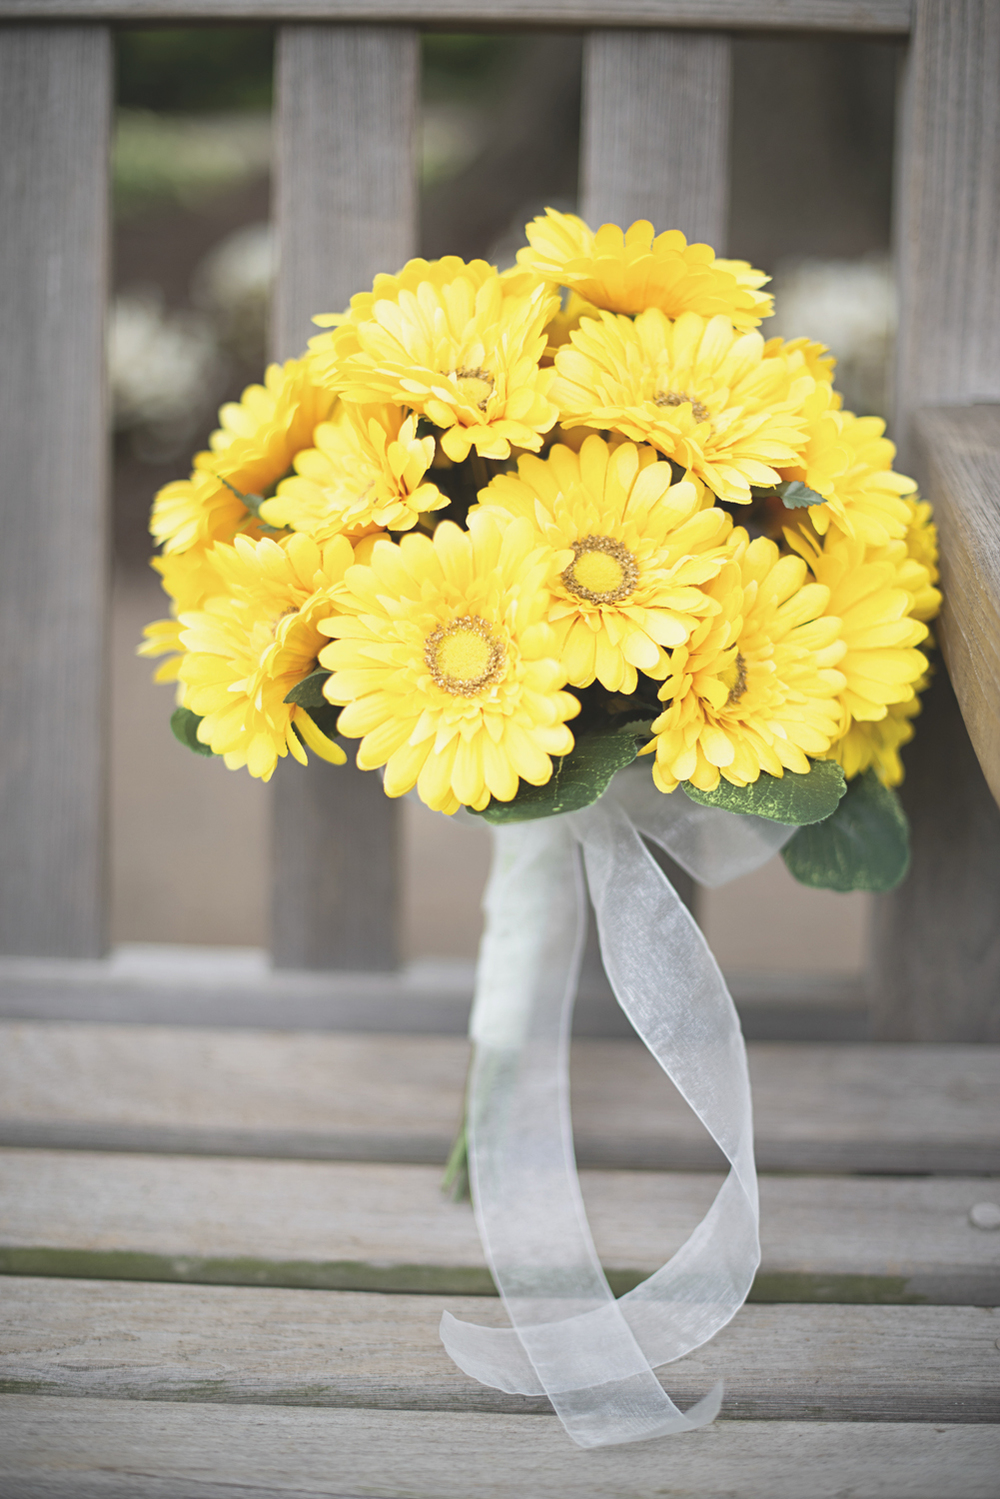 Mariners Museum Wedding | Newport News, Virginia | Yellow daisy bridal bouquet